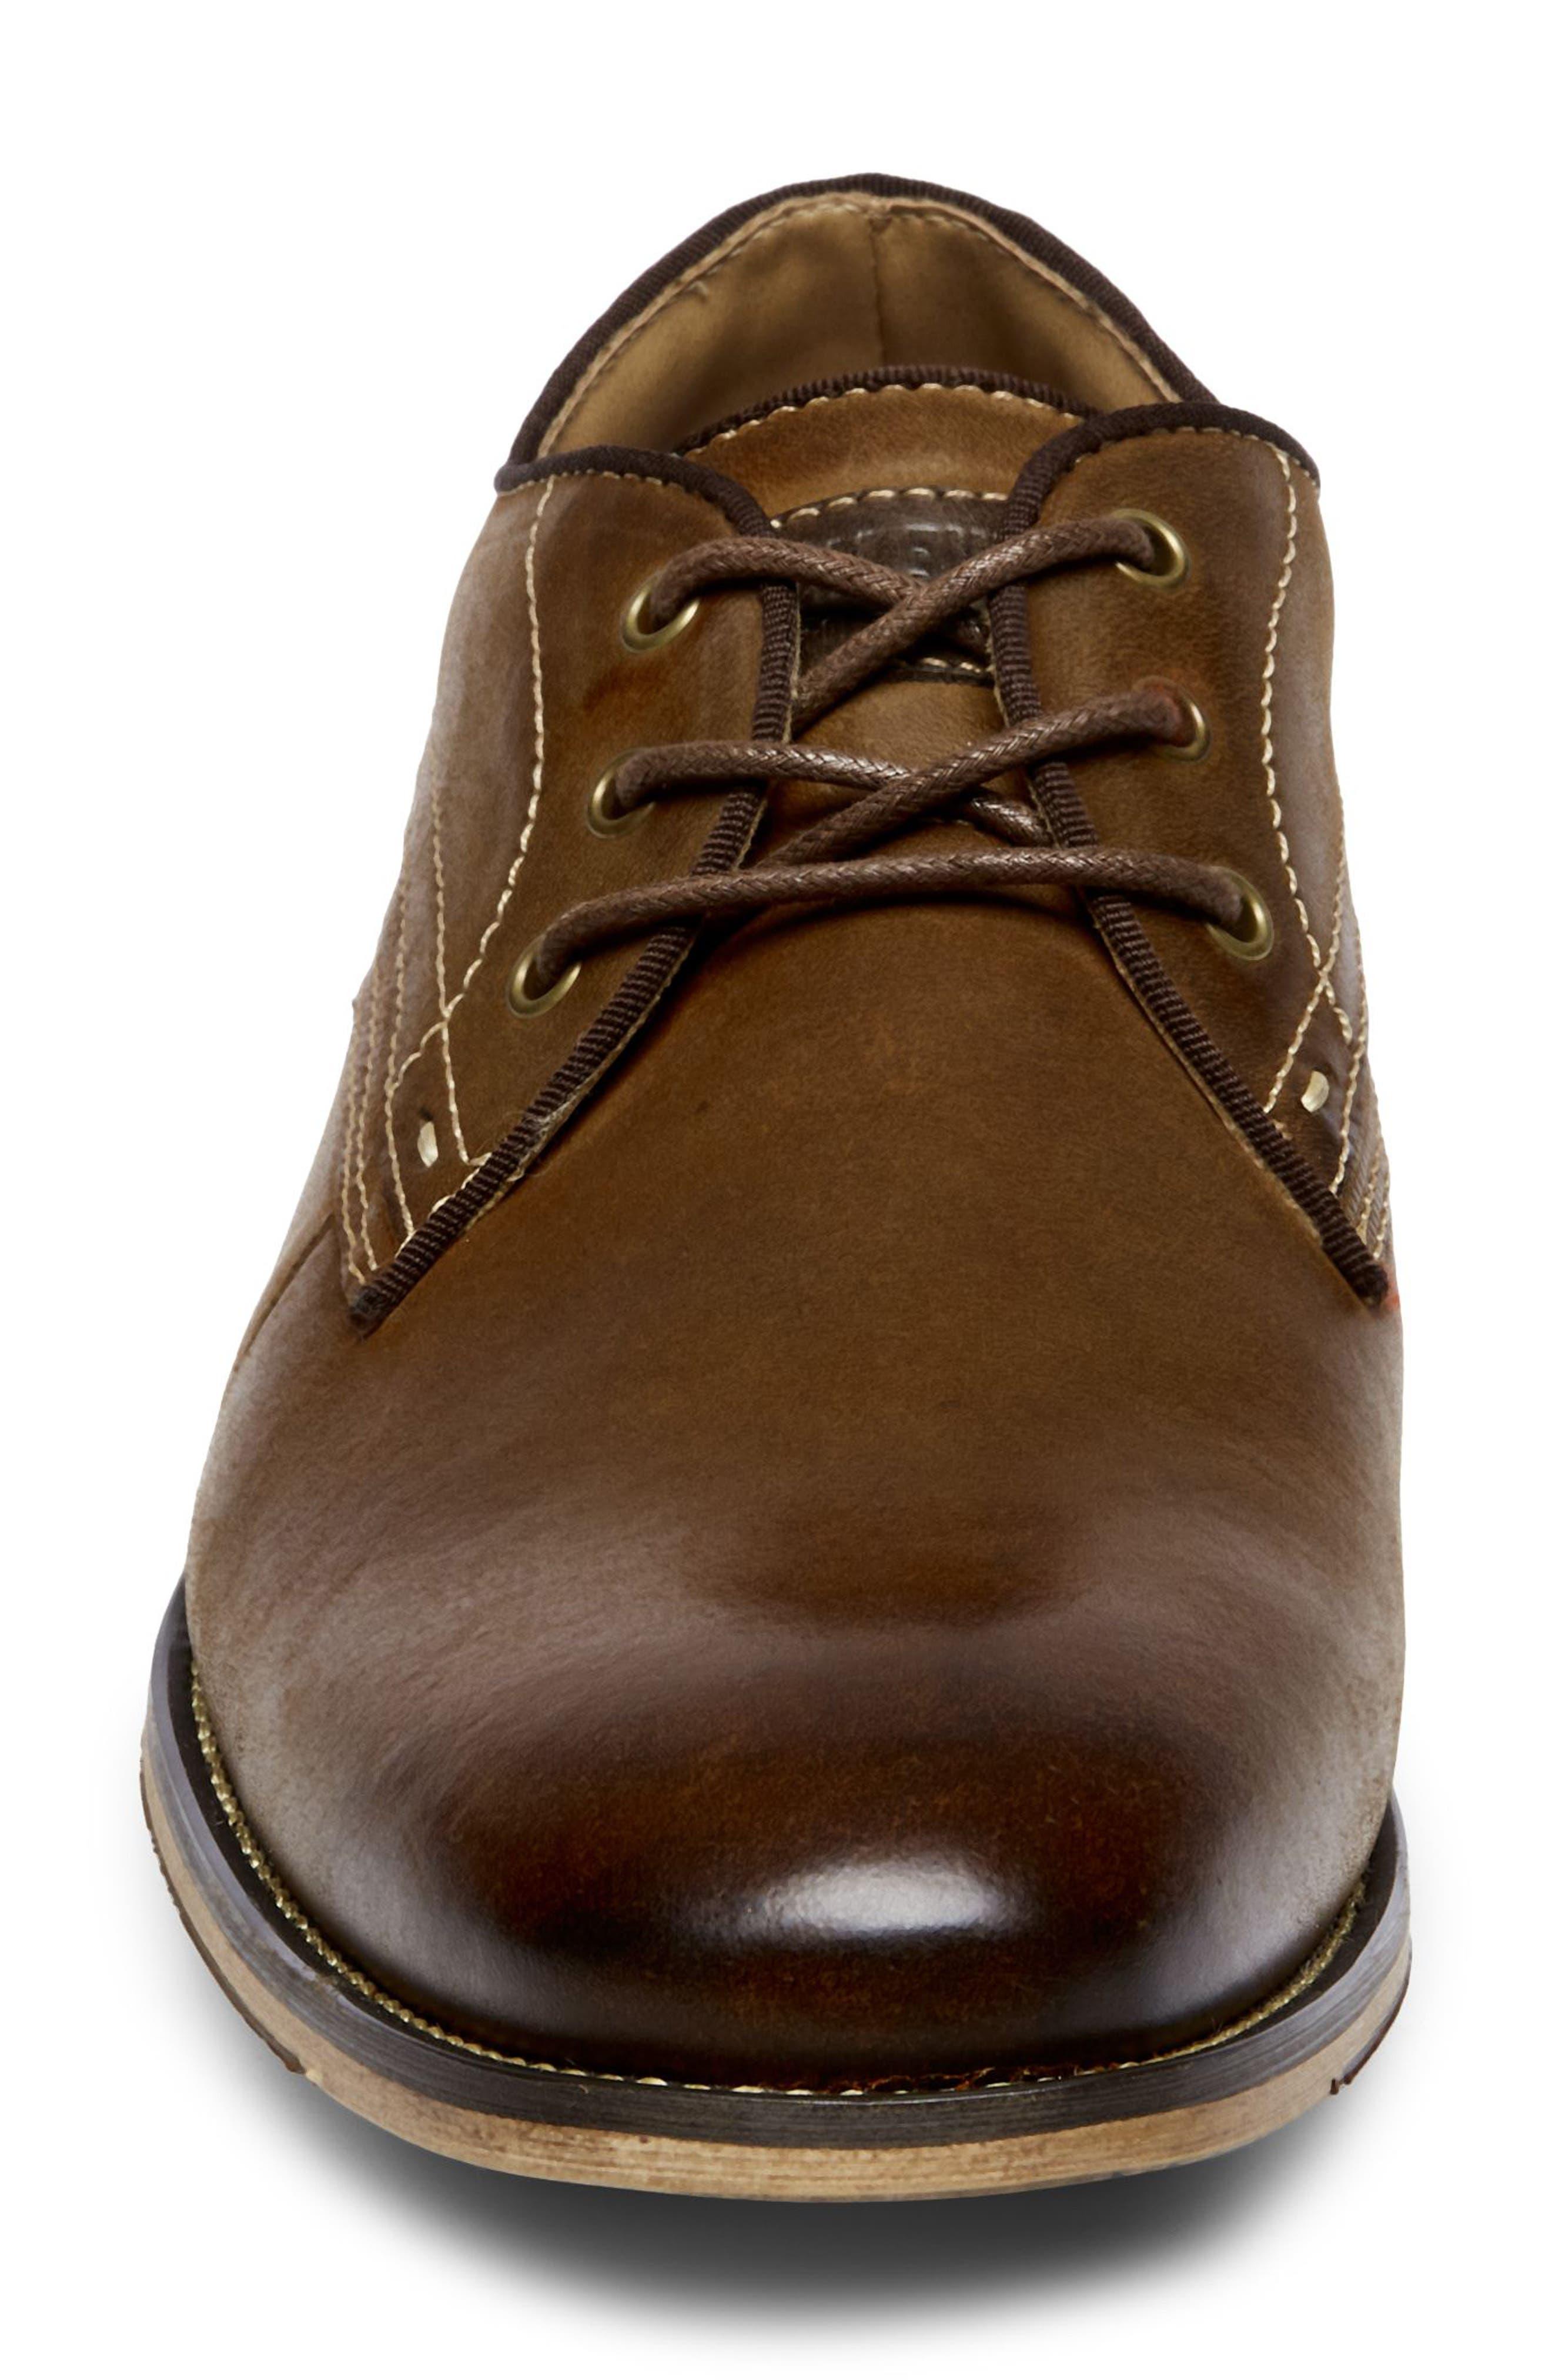 Jetset Plain Toe Derby,                             Alternate thumbnail 4, color,                             Dark Tan Leather